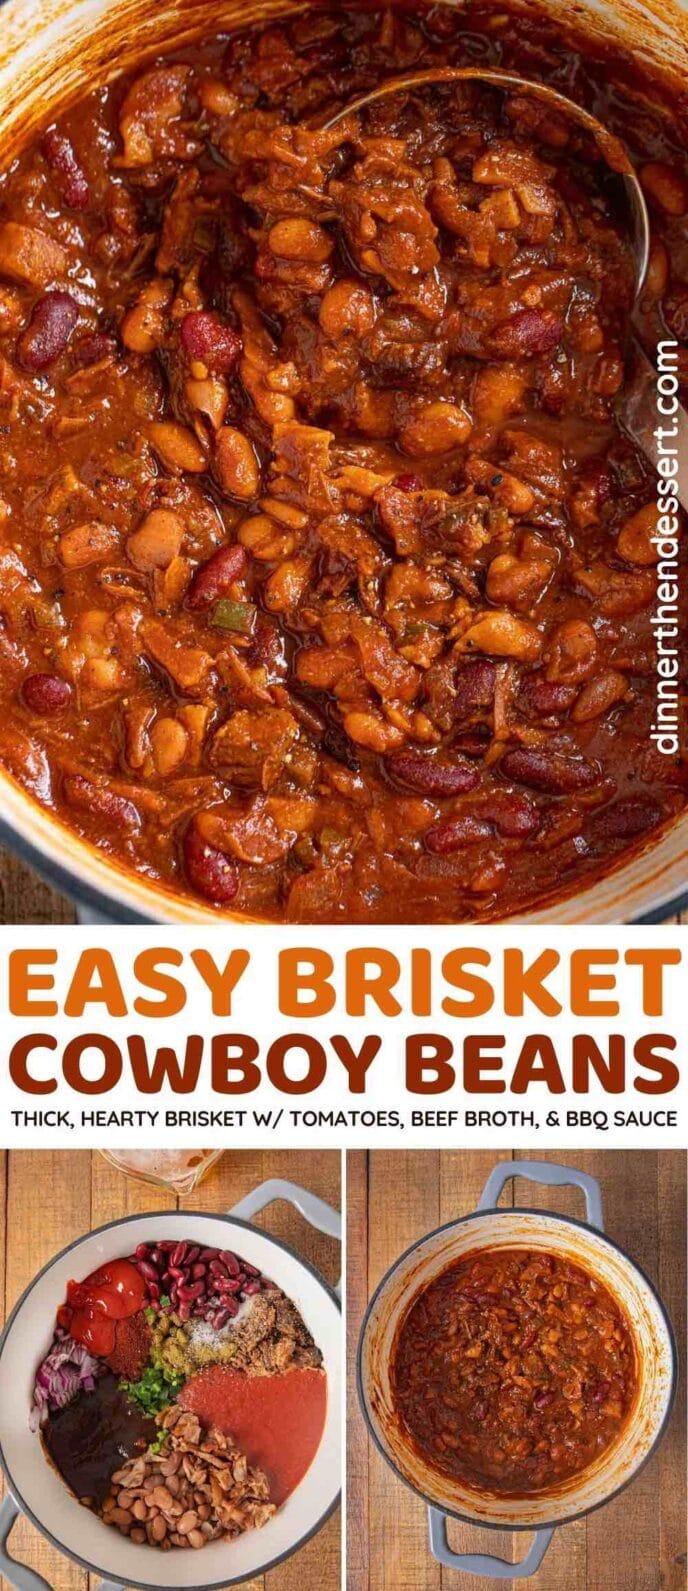 Brisket Cowboy Beans collage